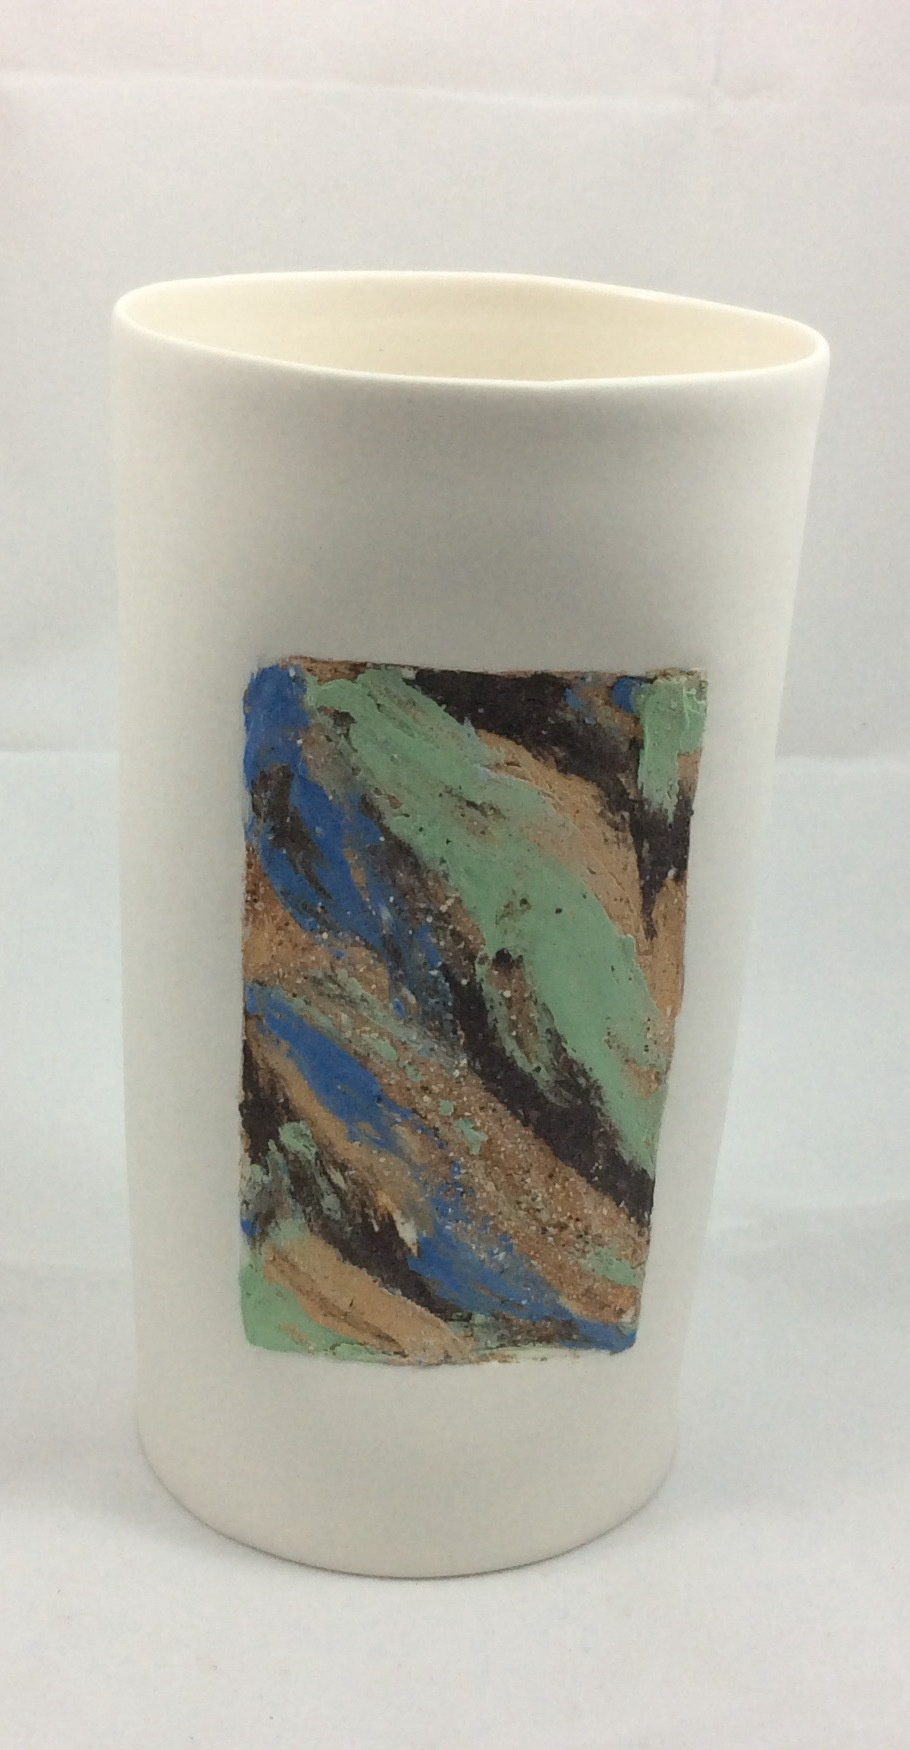 Cylinder Vase - Strata